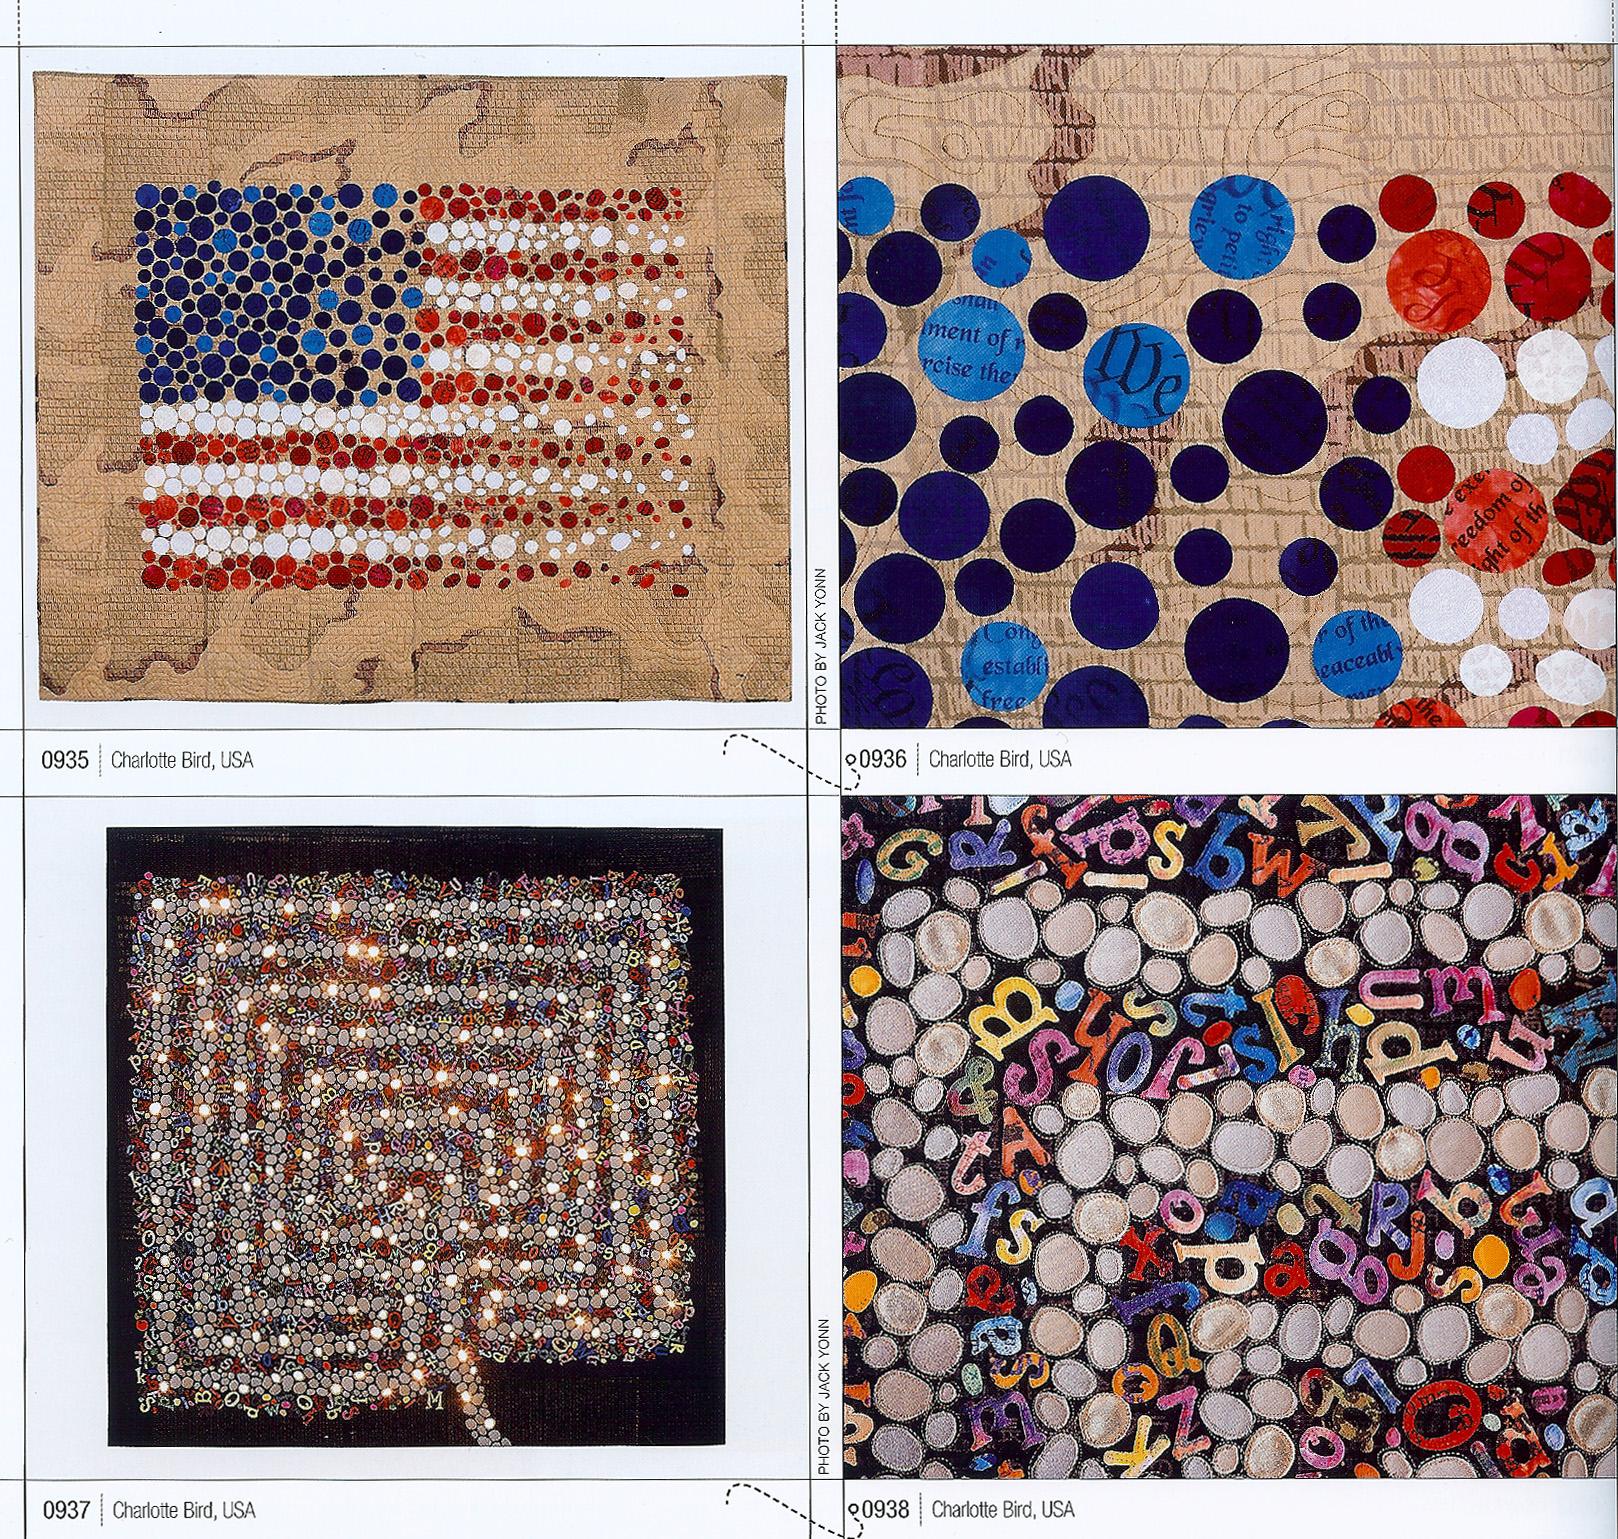 Polka dot american flag qui